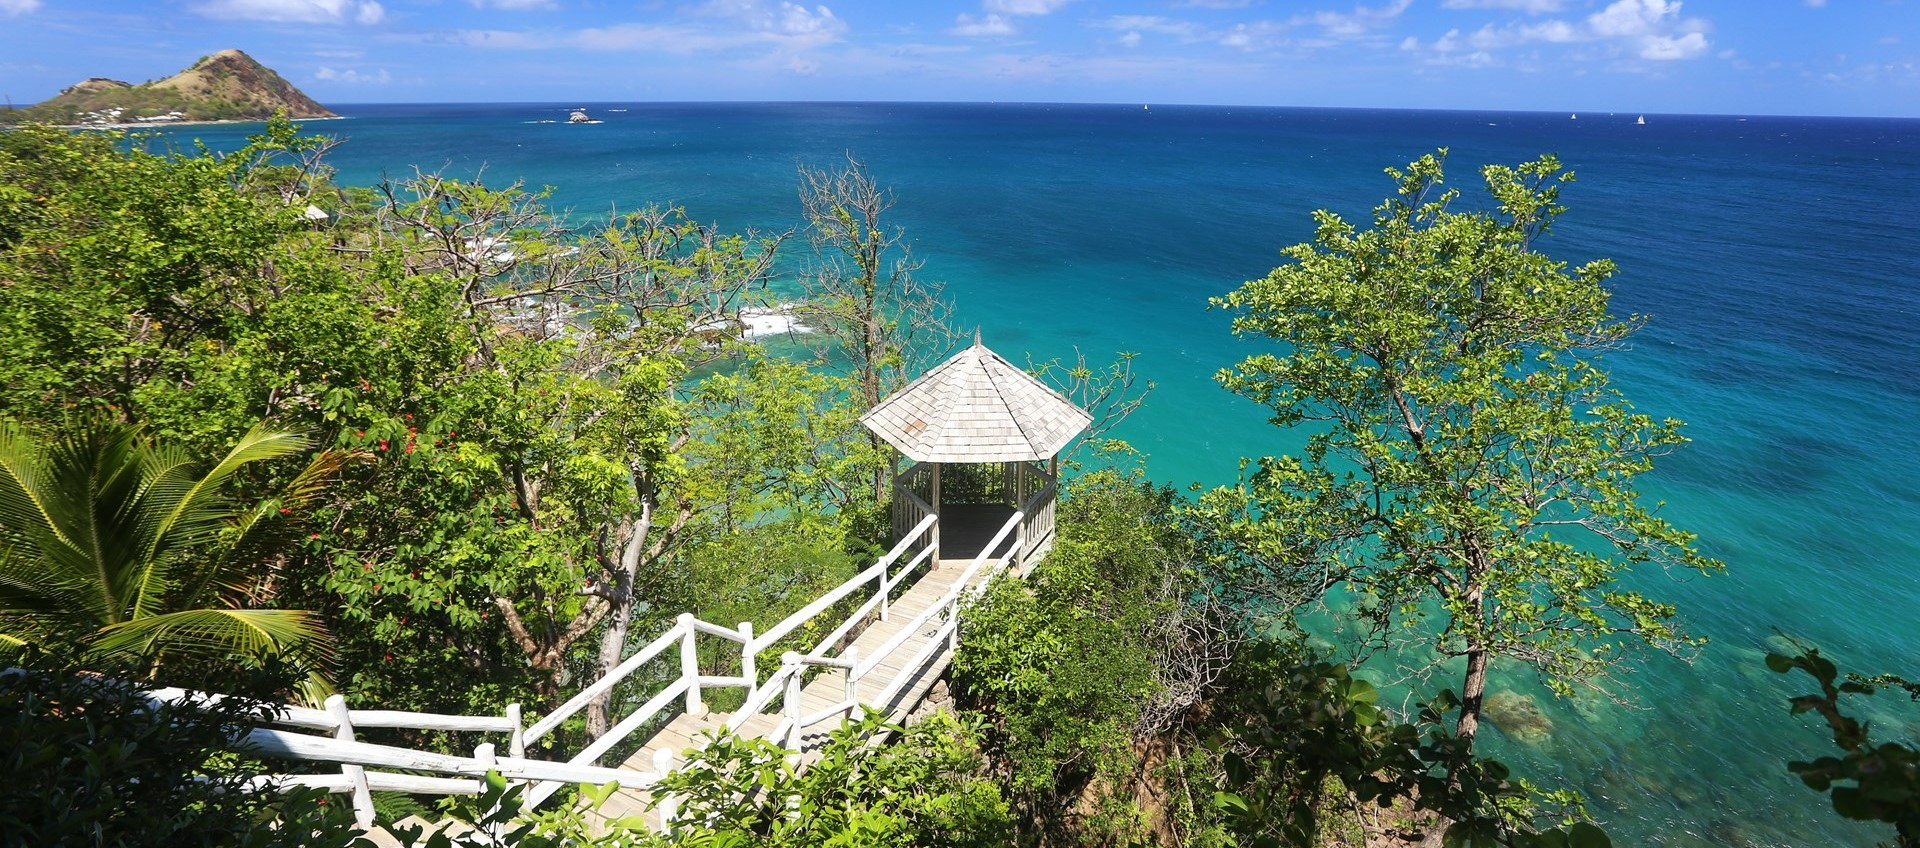 luxury-2-bedroom-caribbean-villa-st-luci